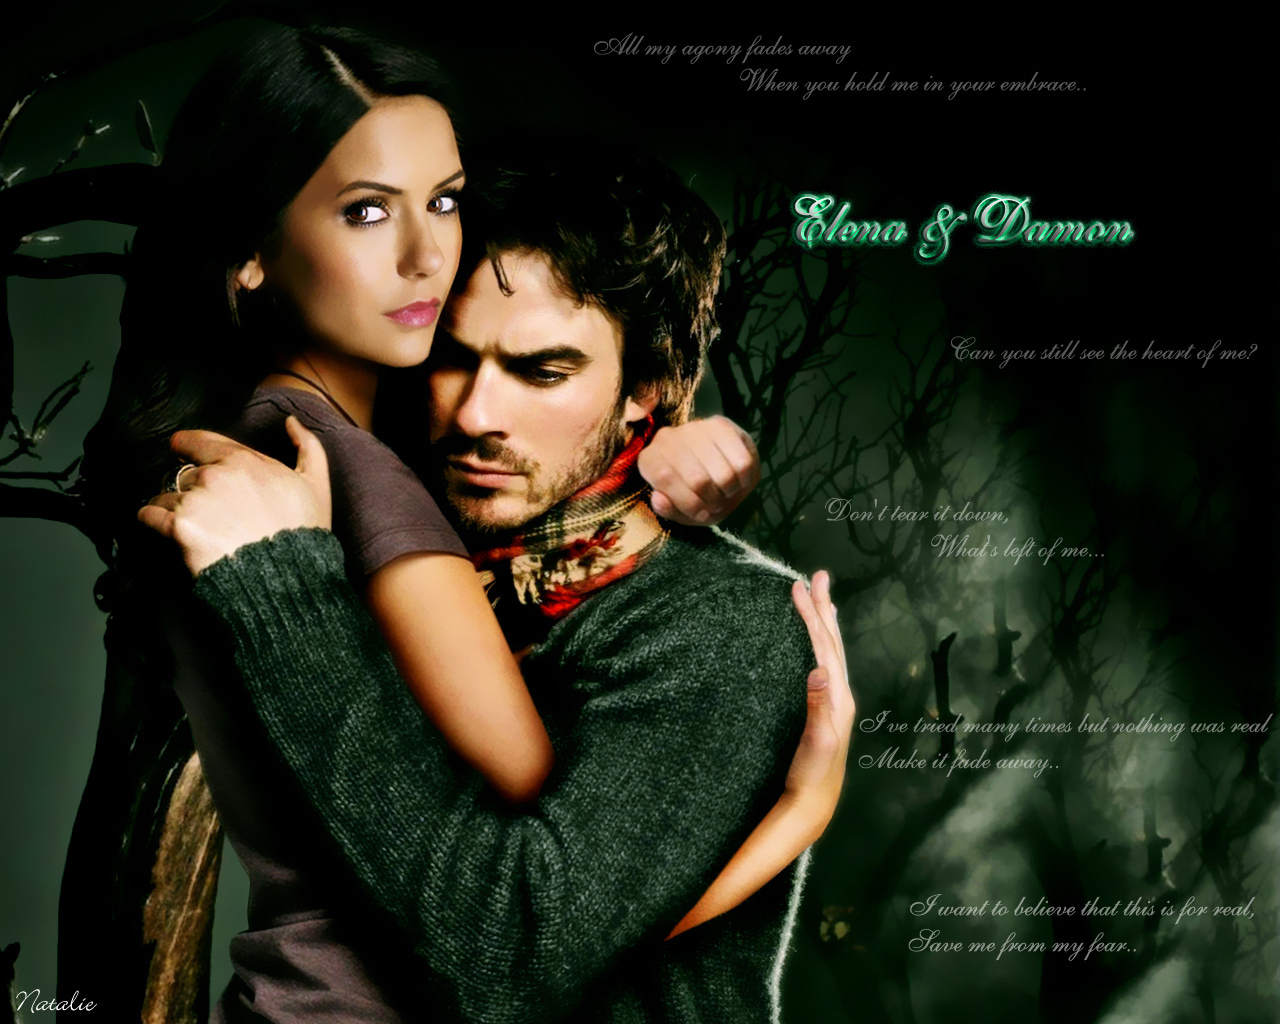 Elena amp Damon   The Vampire Diaries Wallpaper 16023392 1280x1024